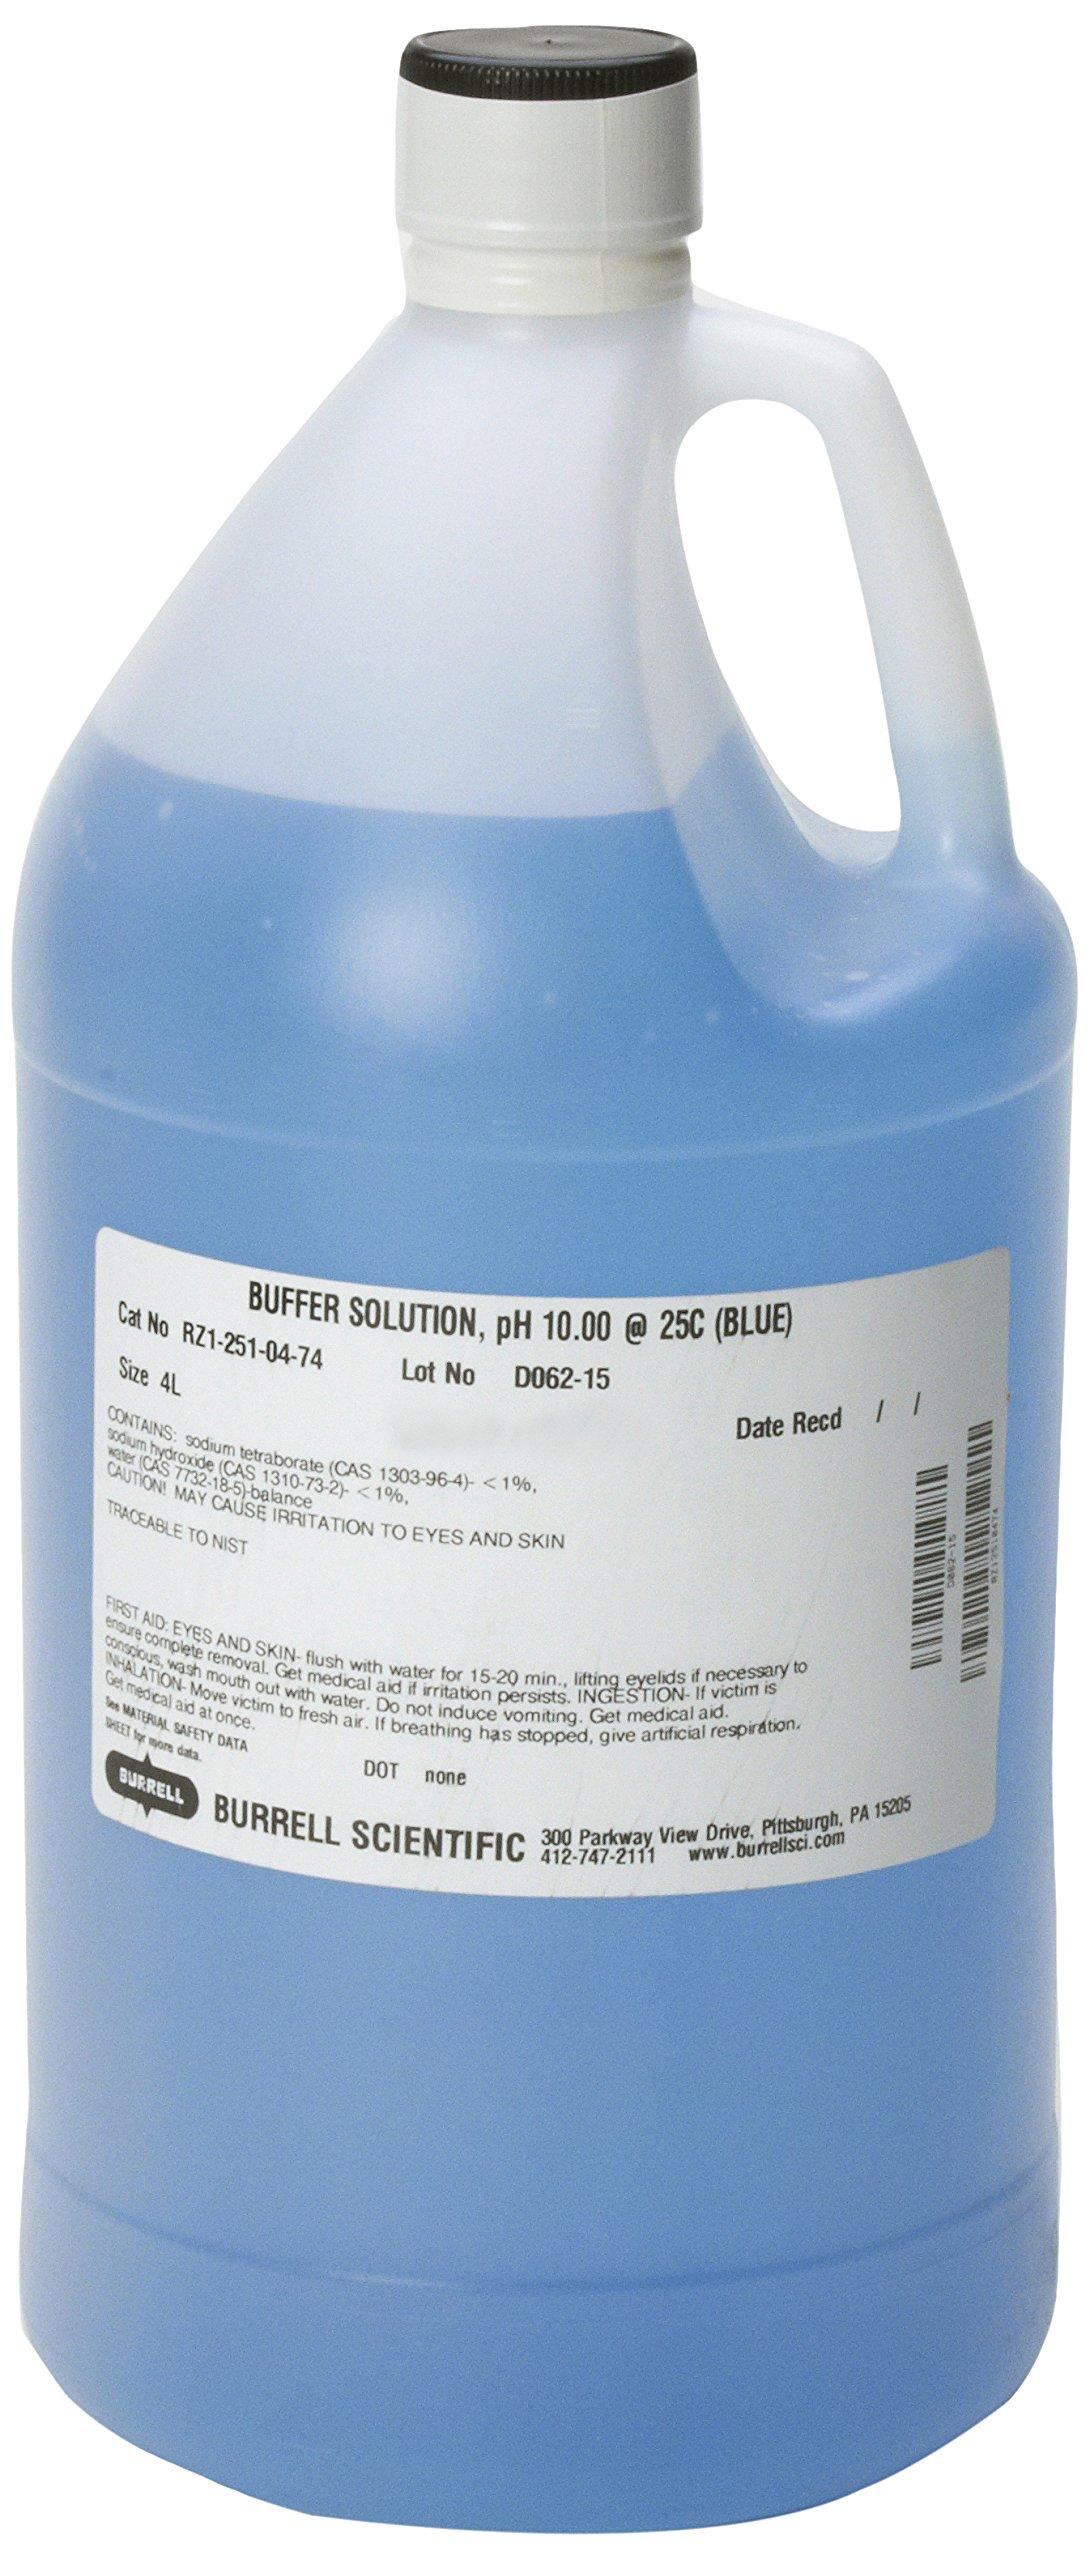 Burrell Scientific RZ1-251-04-74 Buffer Solution, 10.0 pH, 4 L, Blue